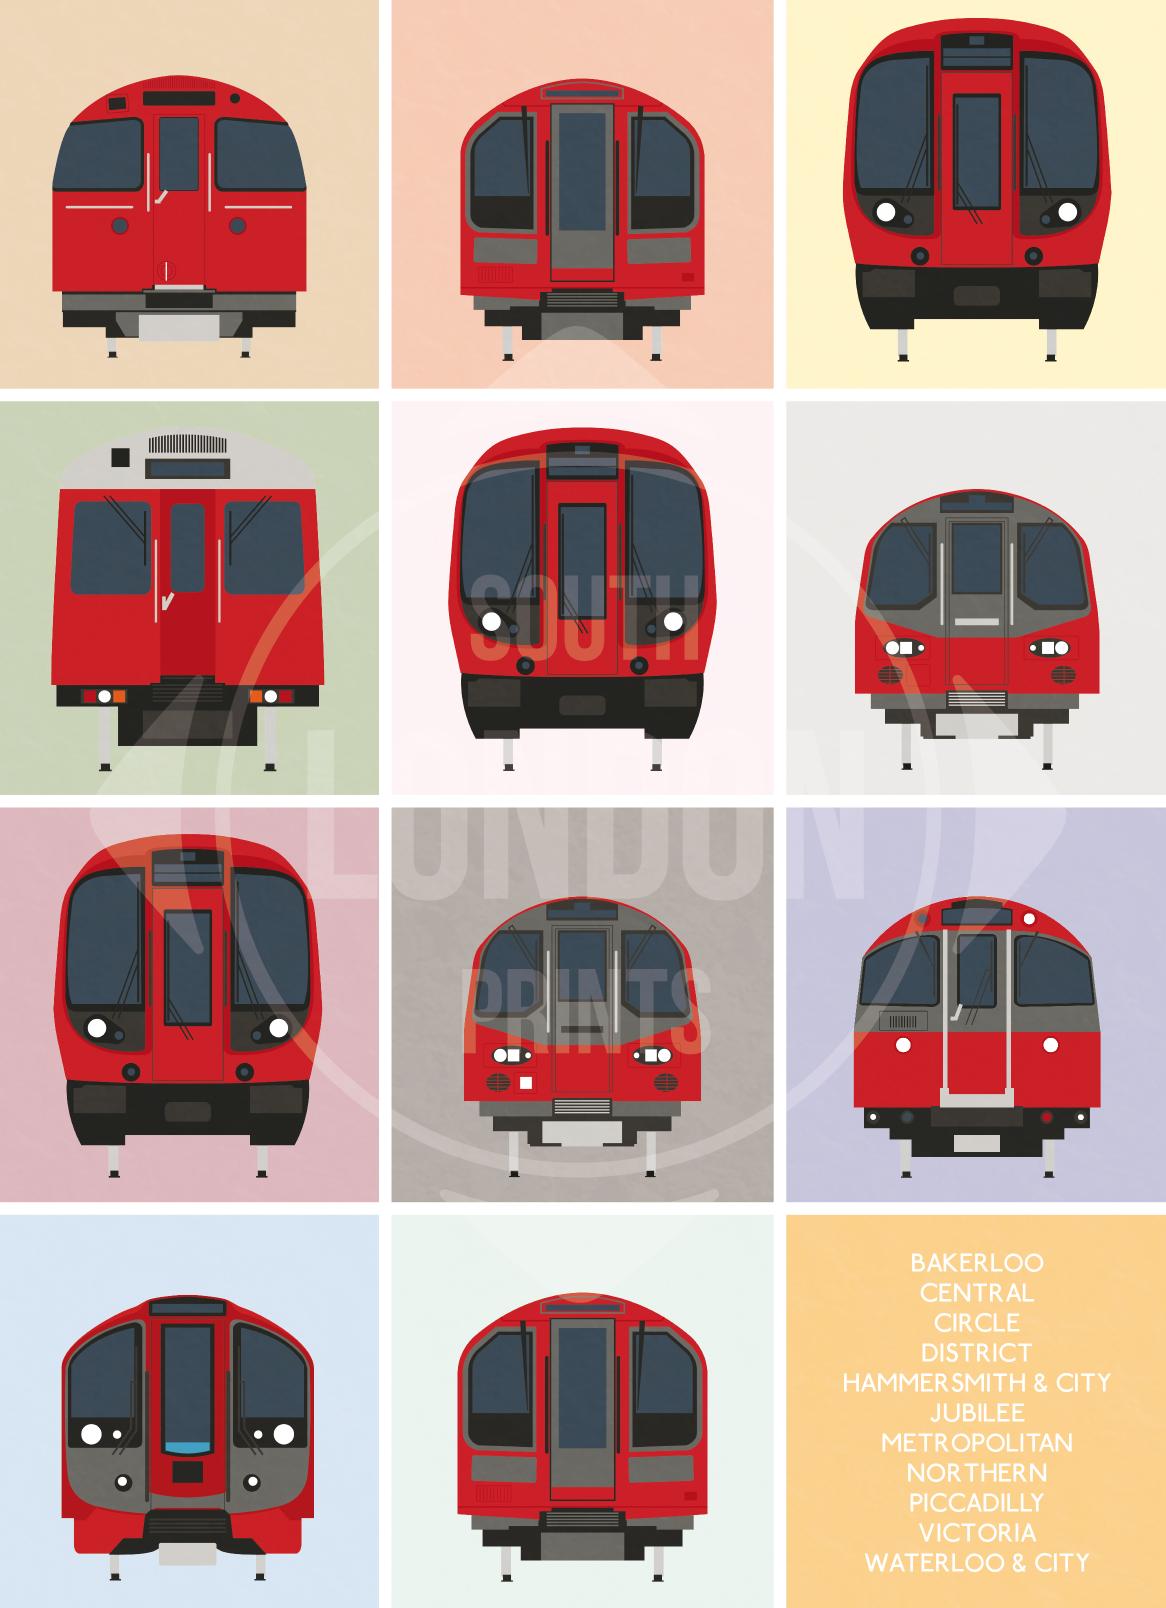 London Underground Tube Trains Print In 2019 London